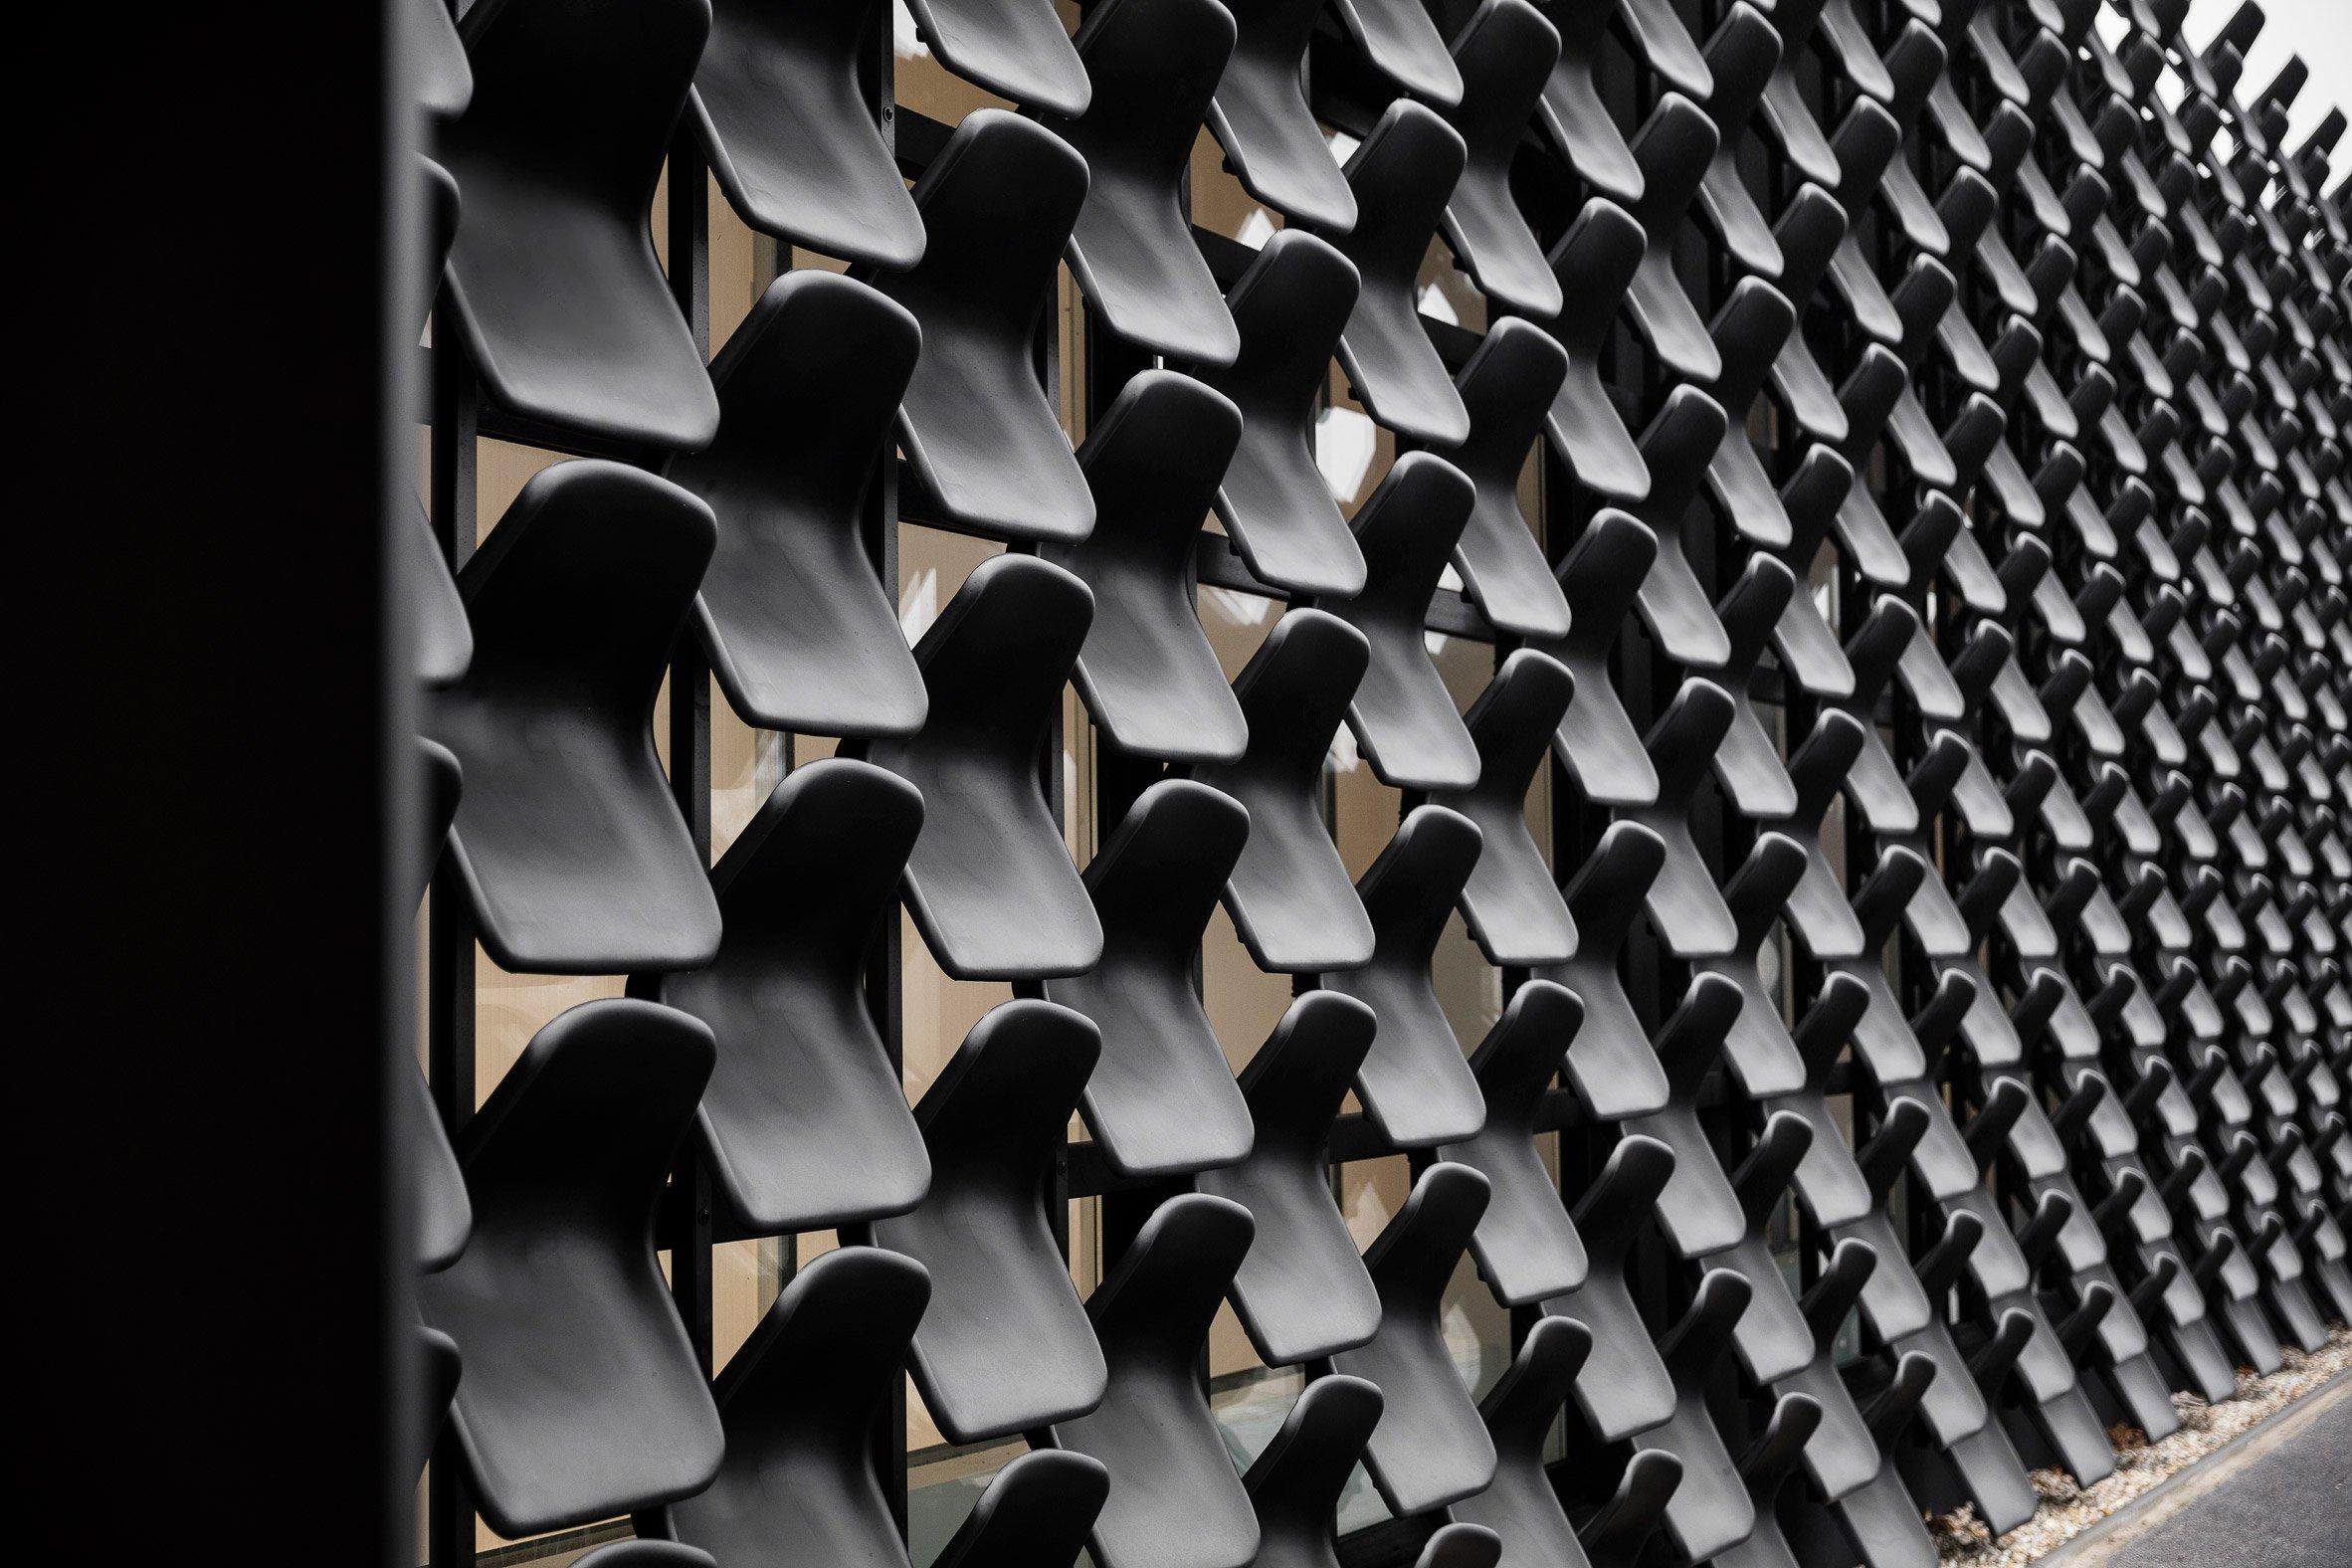 gallery-furniture-chybik-kistof-architecture-retail-czech-republic_dezeen_2364_col_2.jpg